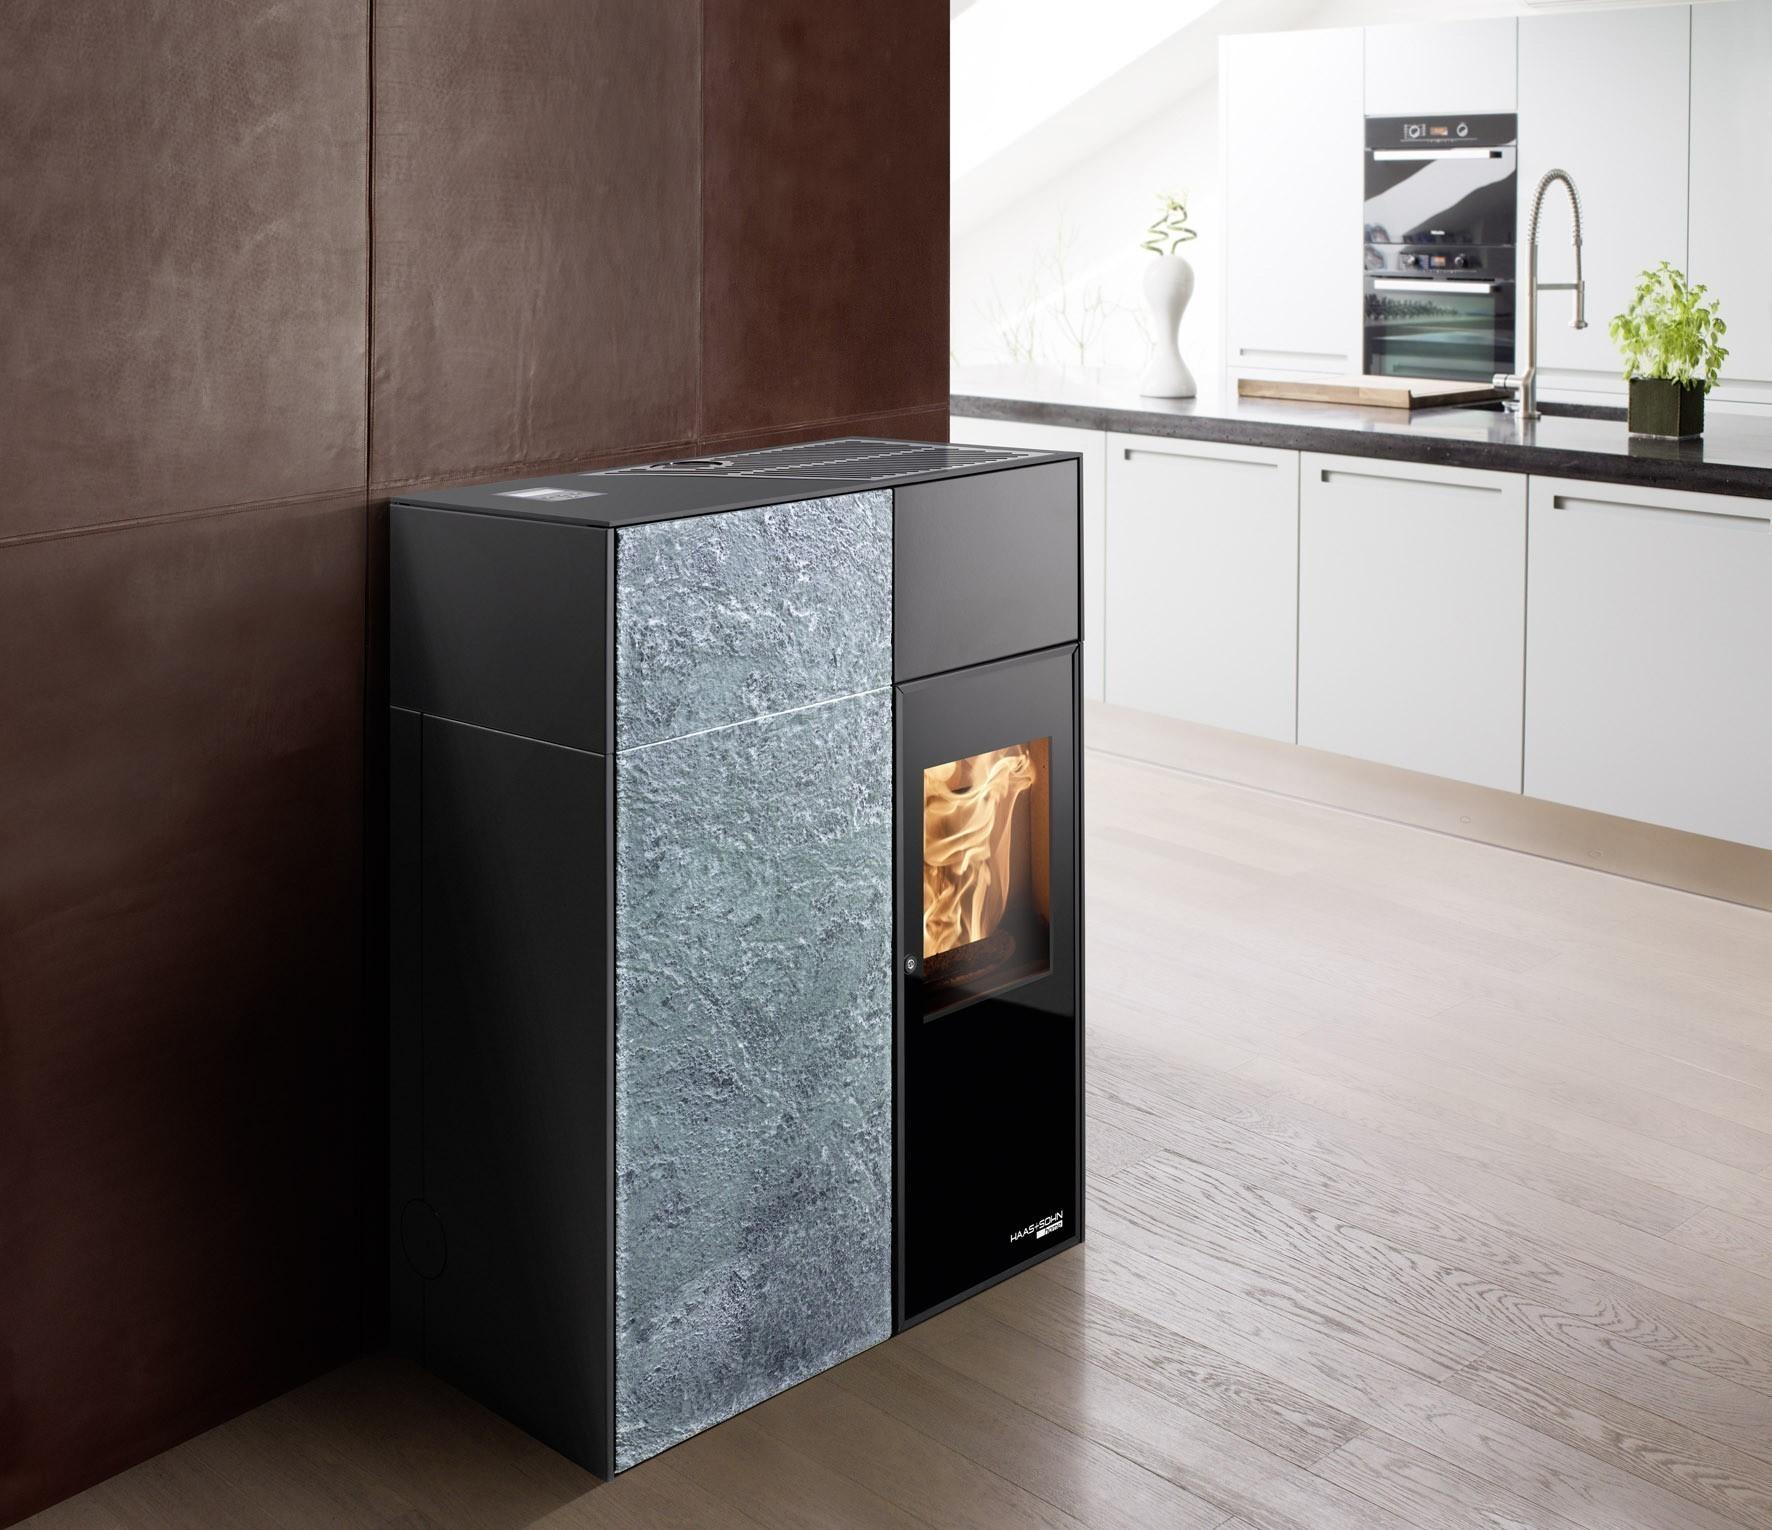 pelletofen haas sohn catania ii rlu speckstein 8kw dibt bild. Black Bedroom Furniture Sets. Home Design Ideas